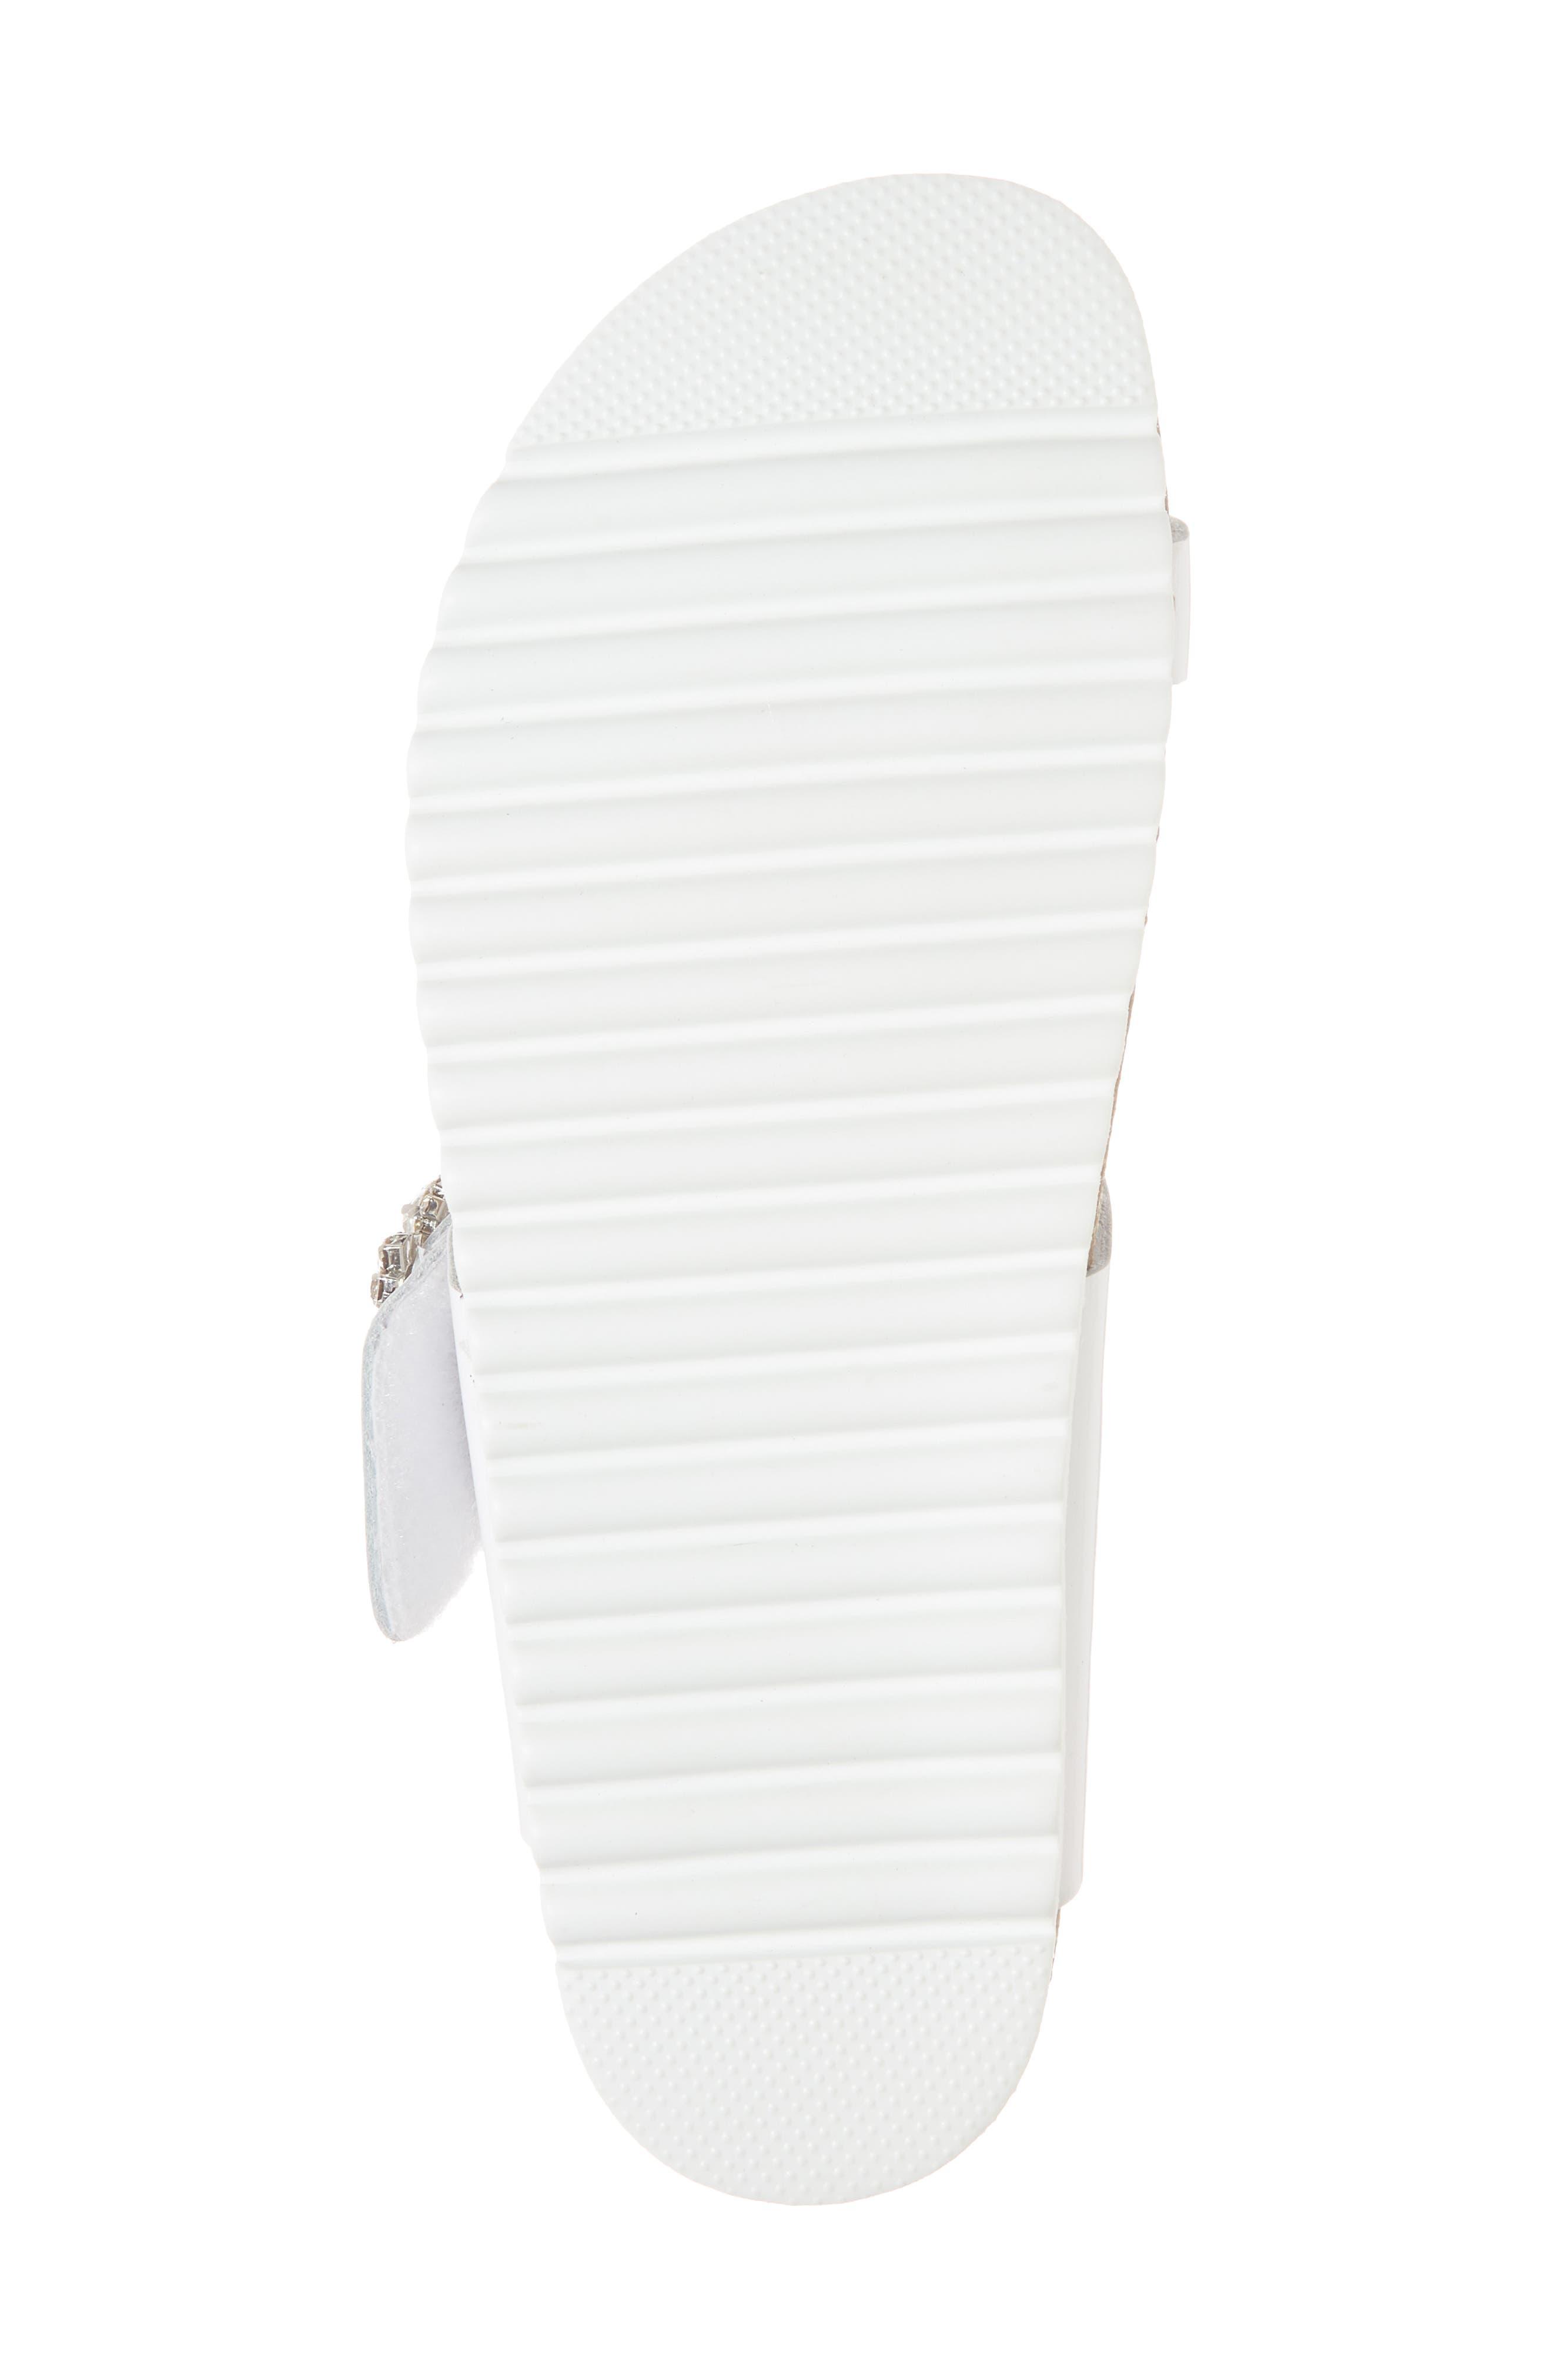 Bianca Embellished Slide Sandal,                             Alternate thumbnail 6, color,                             White Patent/ Silver